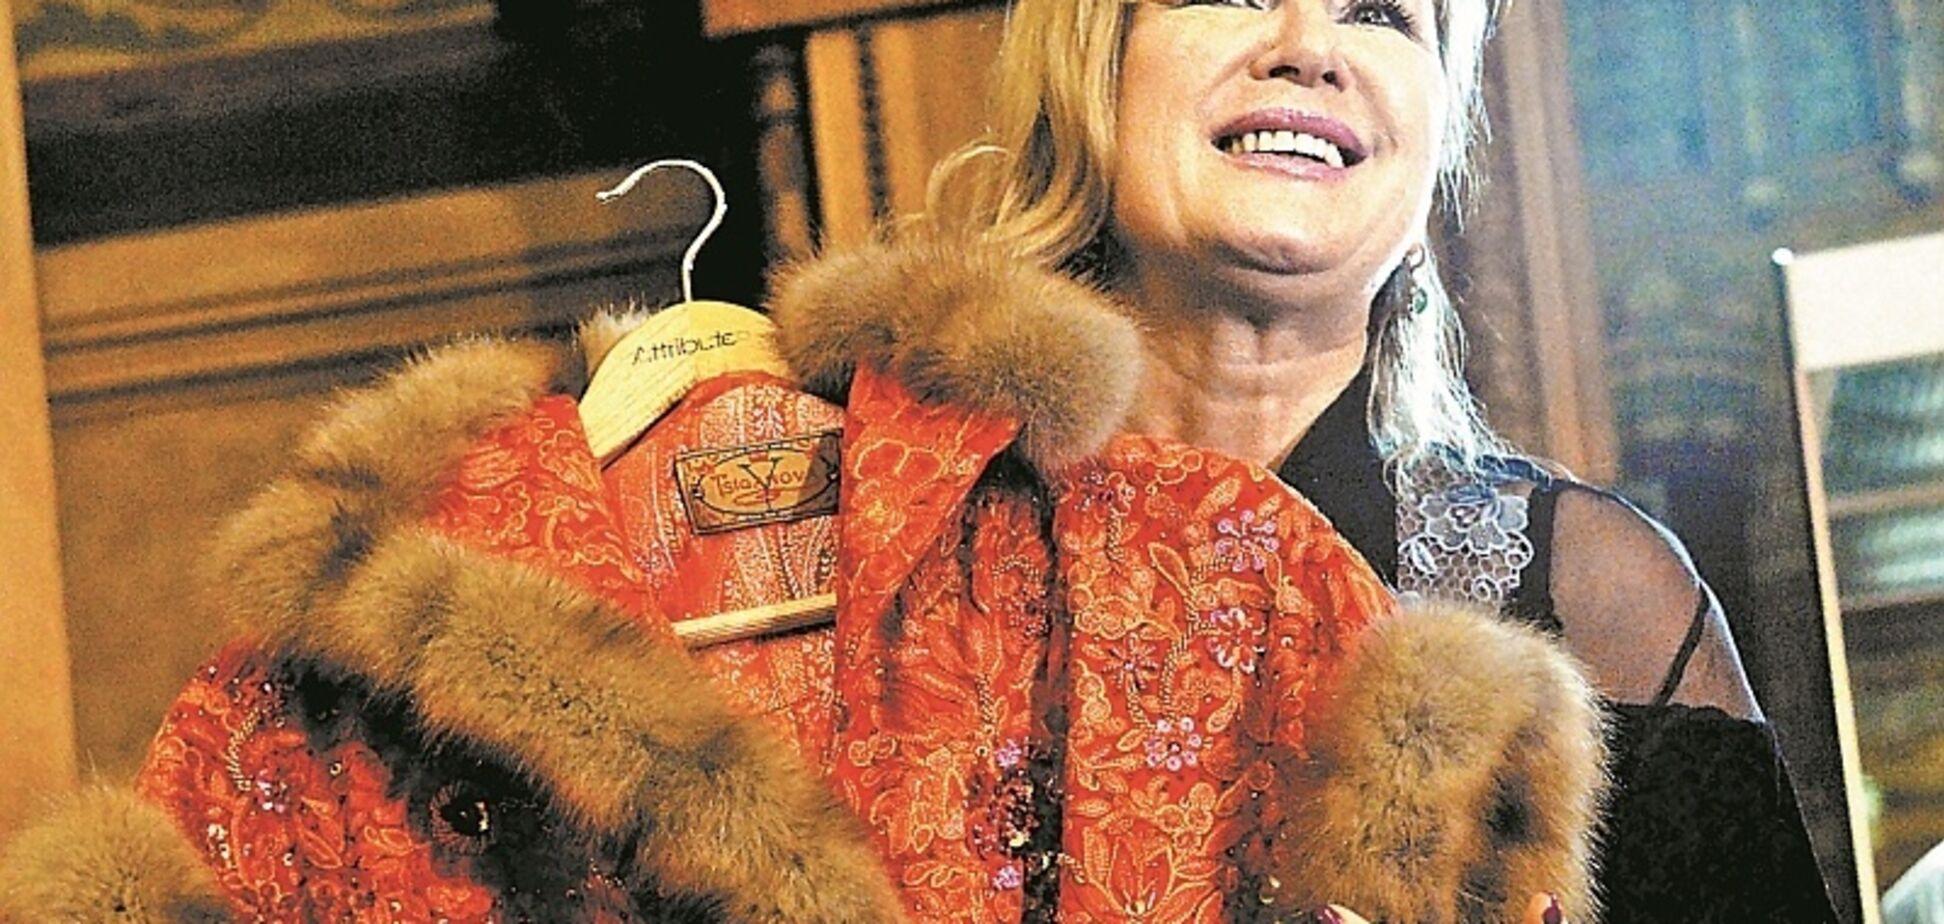 Звездная соратница ''Л/ДНР'' похвалилась странным подарком для жены Трампа